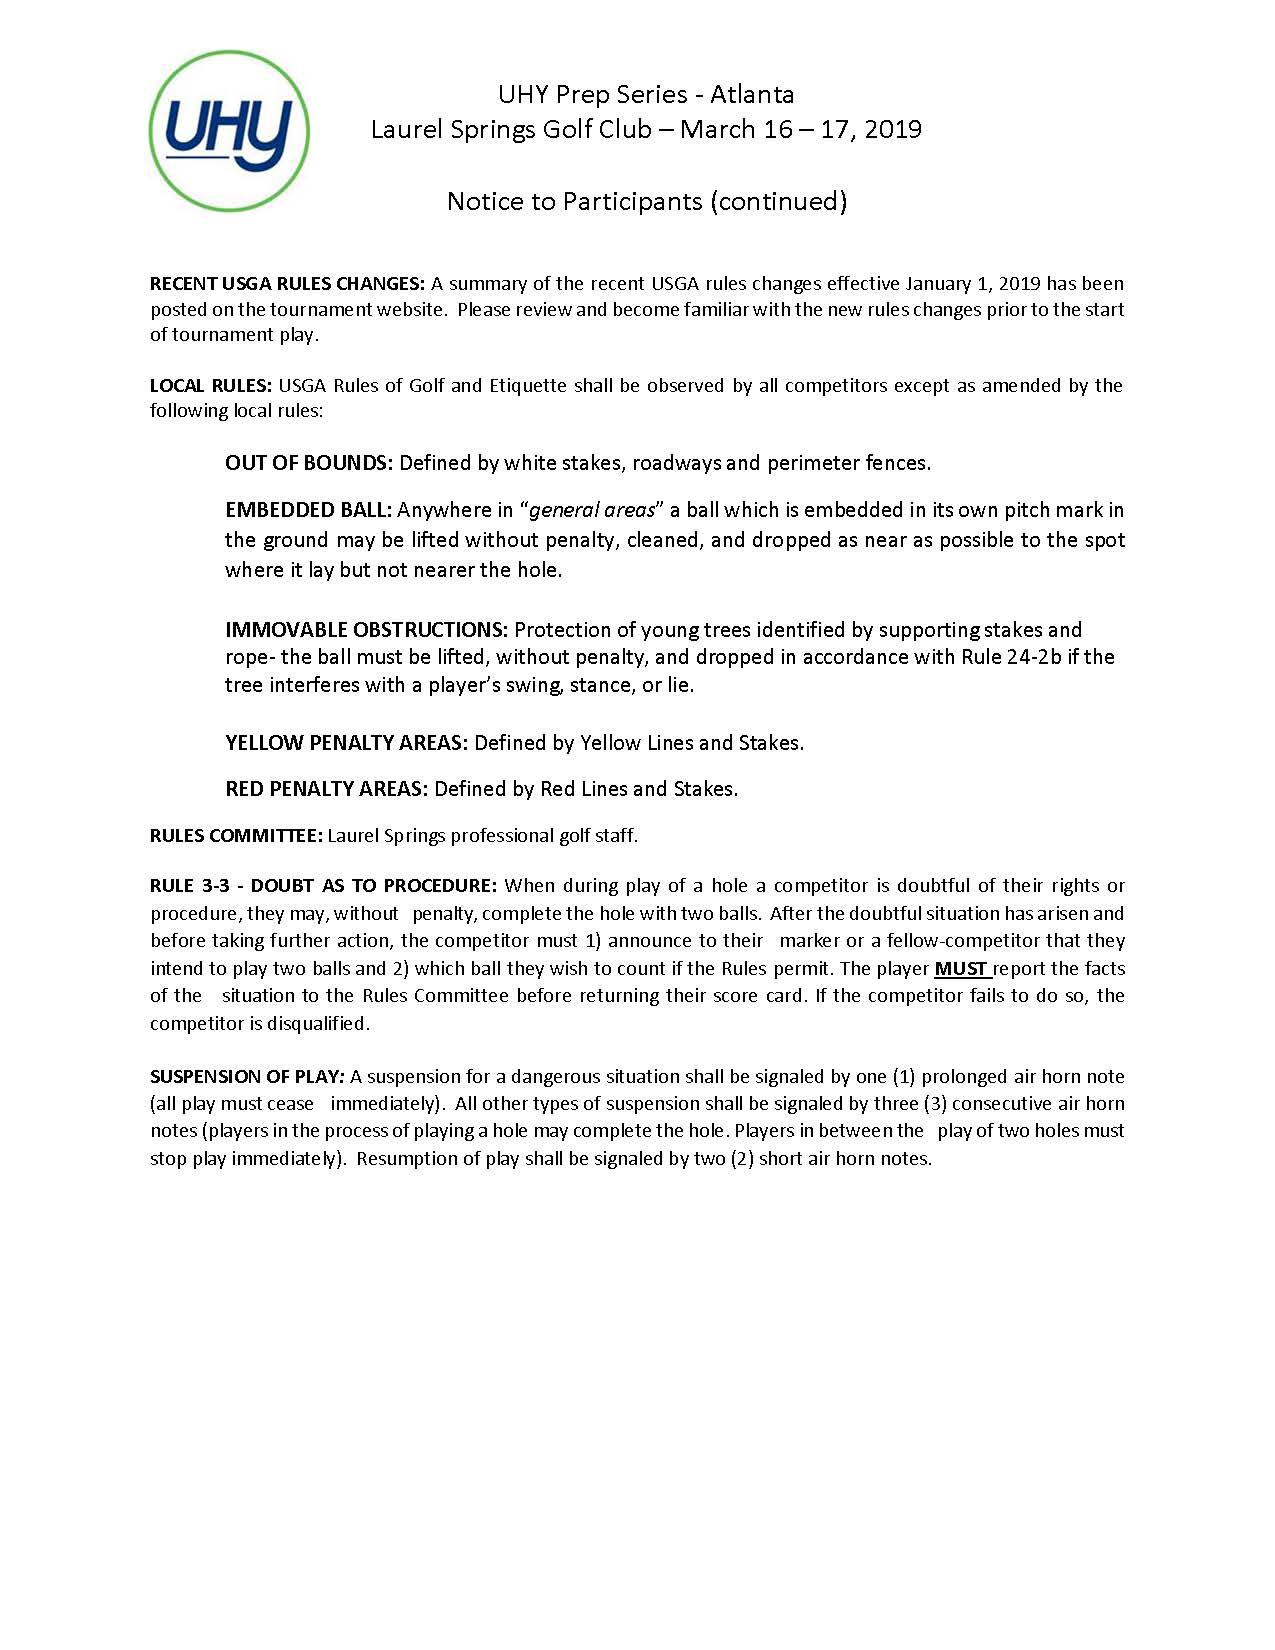 Rules Sheet - UHY Prep Series - Atlanta (MAR 16 - 17 2019)_Page_2.jpg